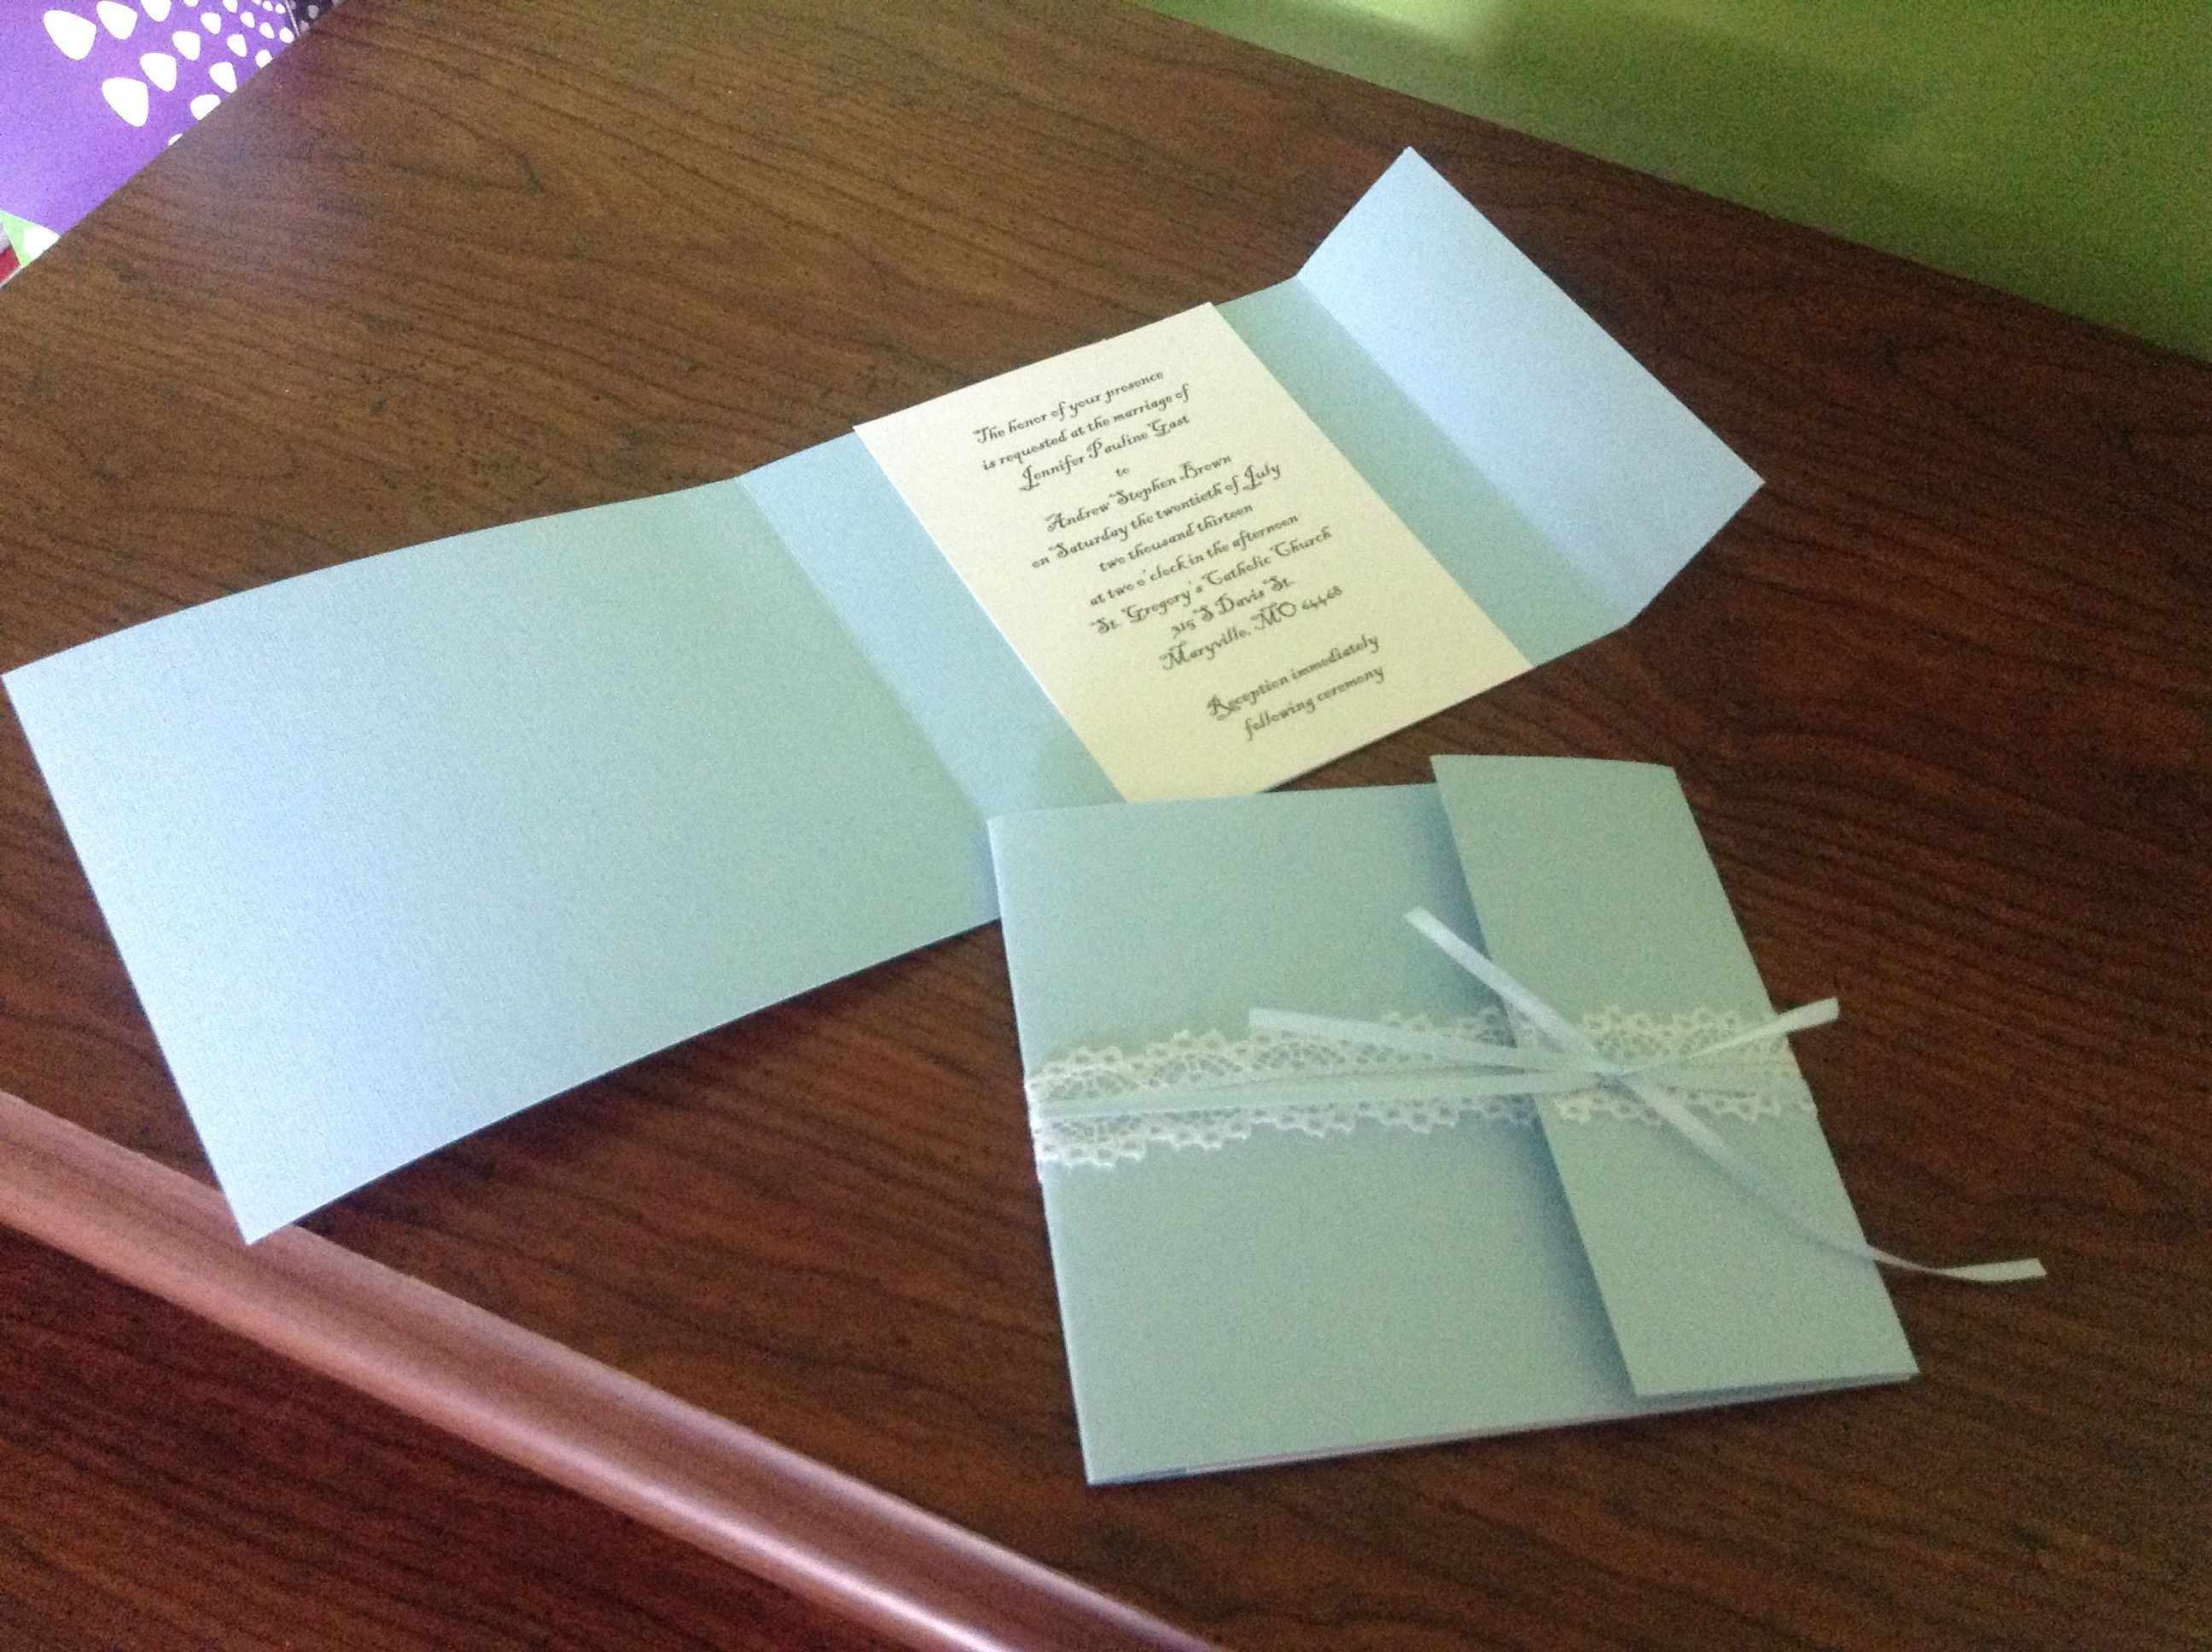 Homemade wedding invitations outdoor wedding ideas pinterest